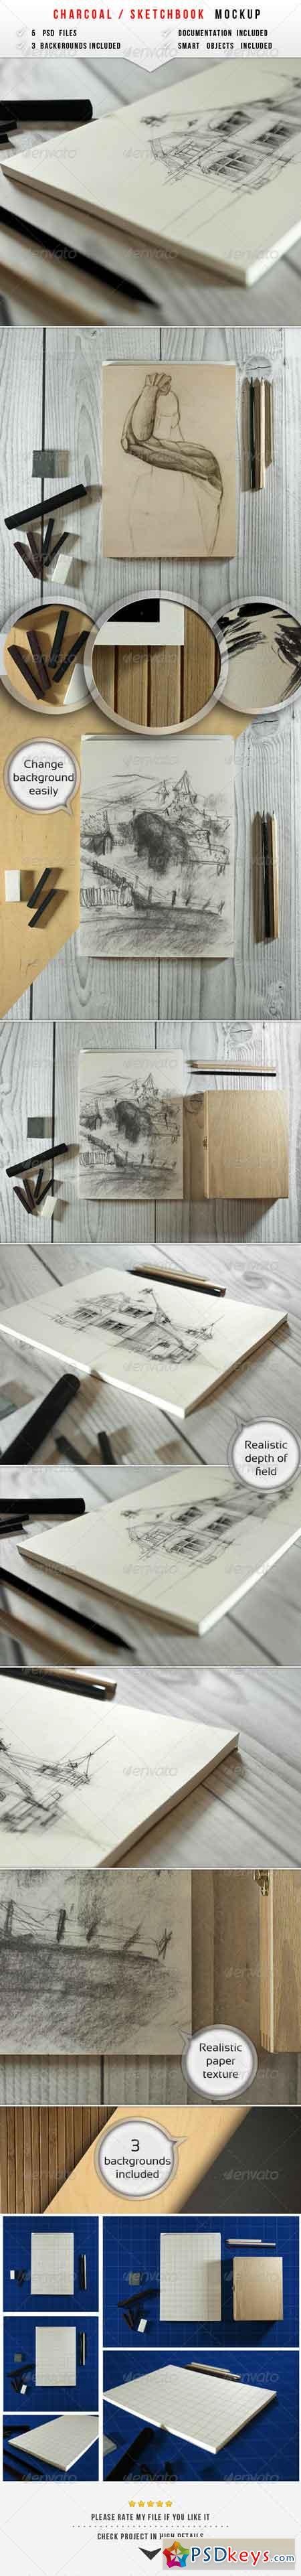 Sketch & Charcoal Mockup 6285849